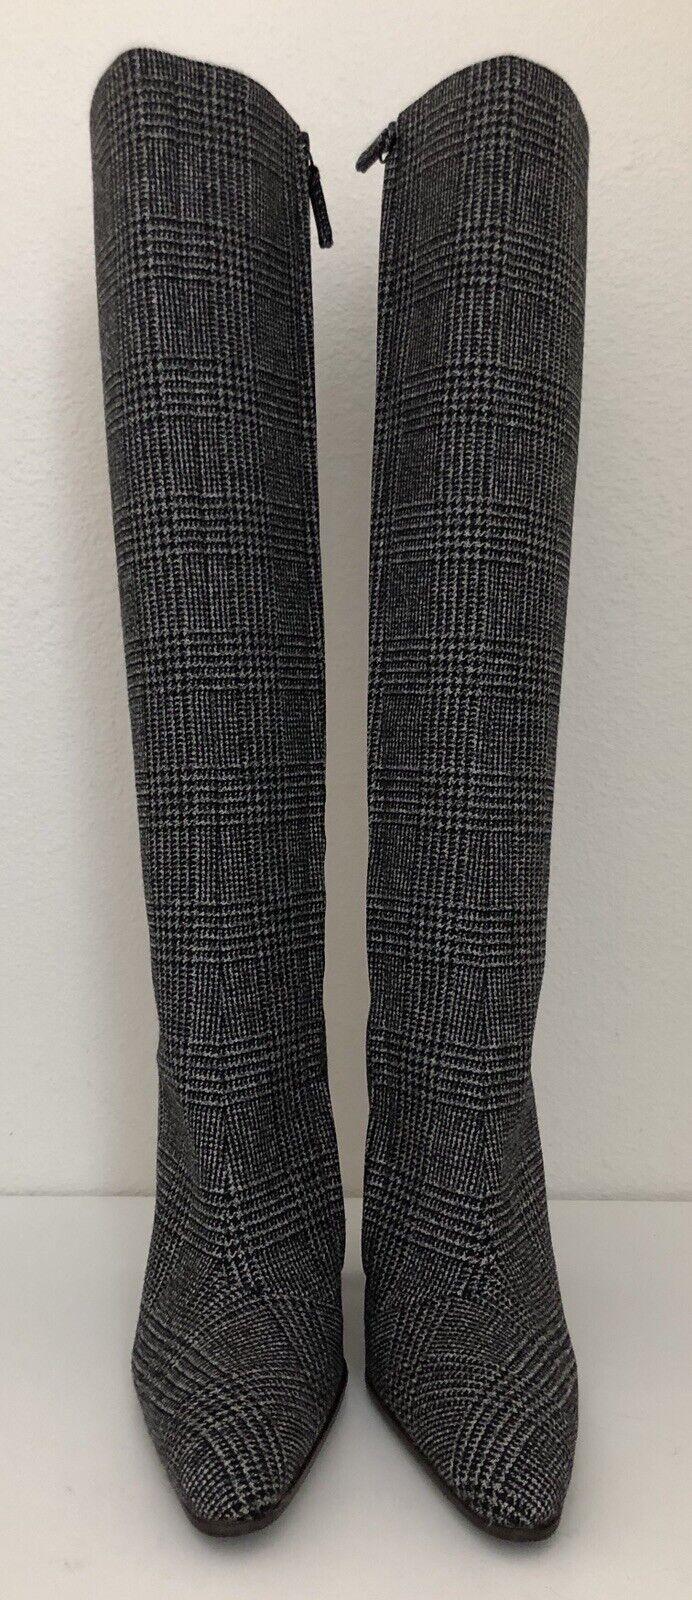 Balenciaga Knee High High High Boot Prince Of Wales Tweed High Boots  sz 35 5  1790 6be096